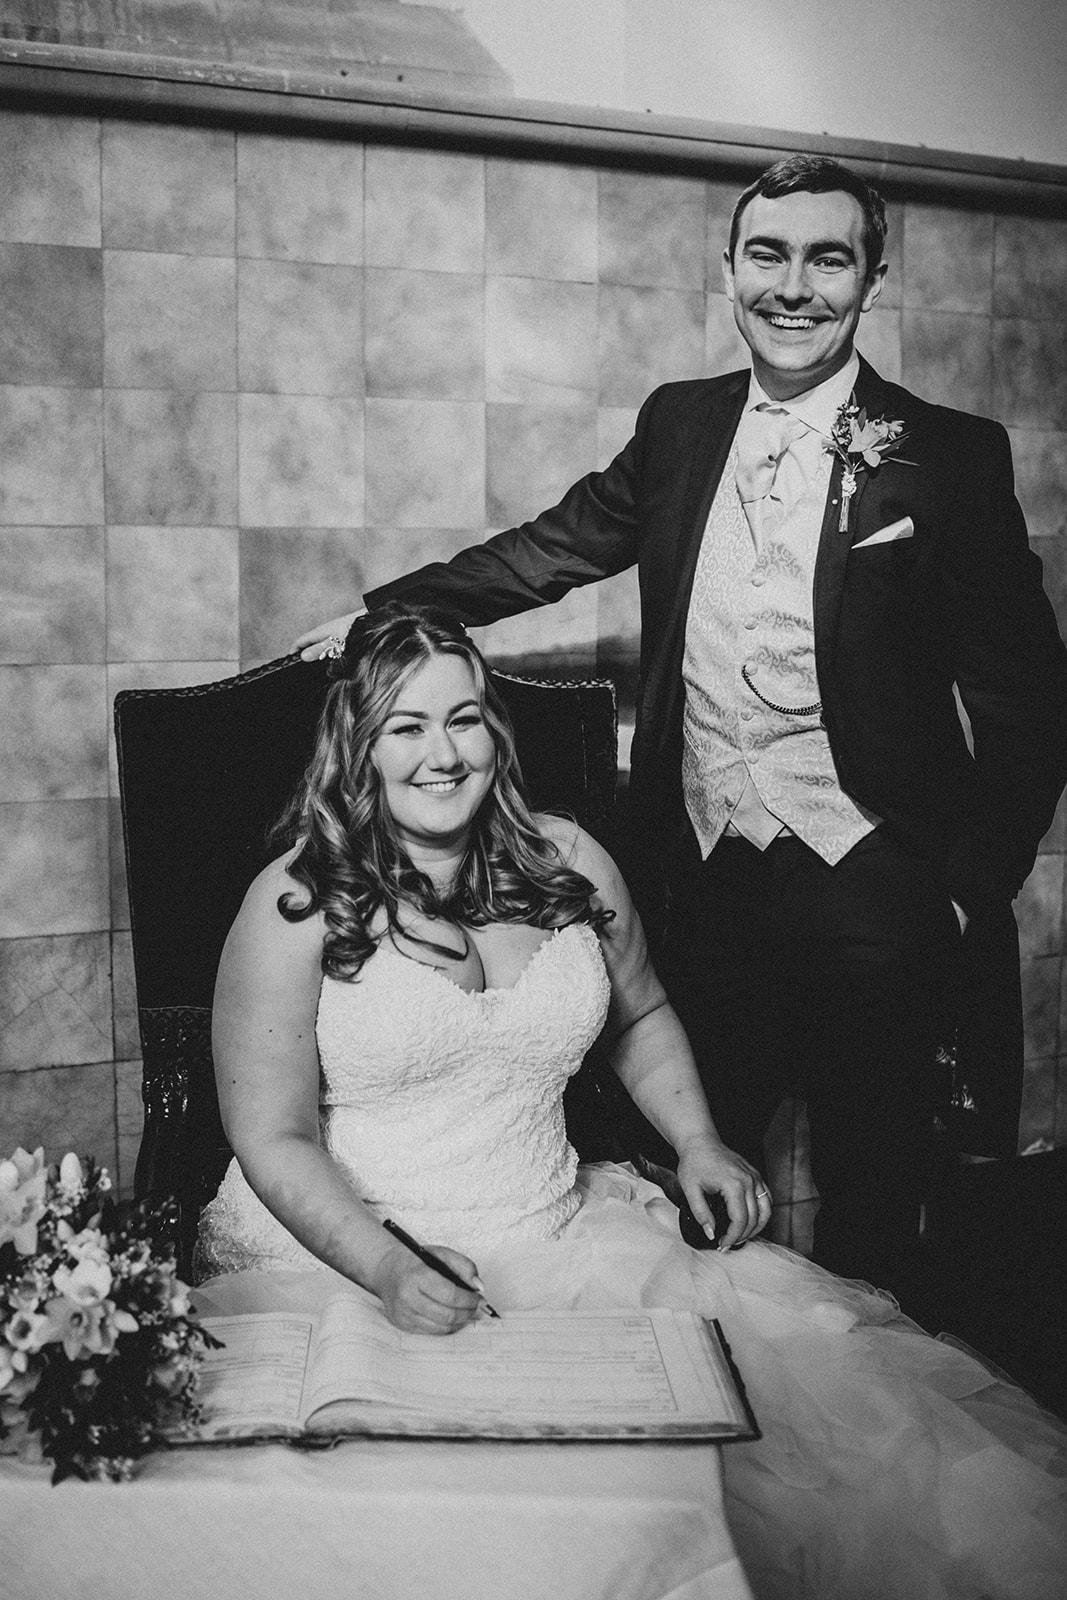 bride and groom signing register - rutland wedding - fun wedding - east midlands wedding planner - Leicestershire wedding planning - nottingham wedding planner